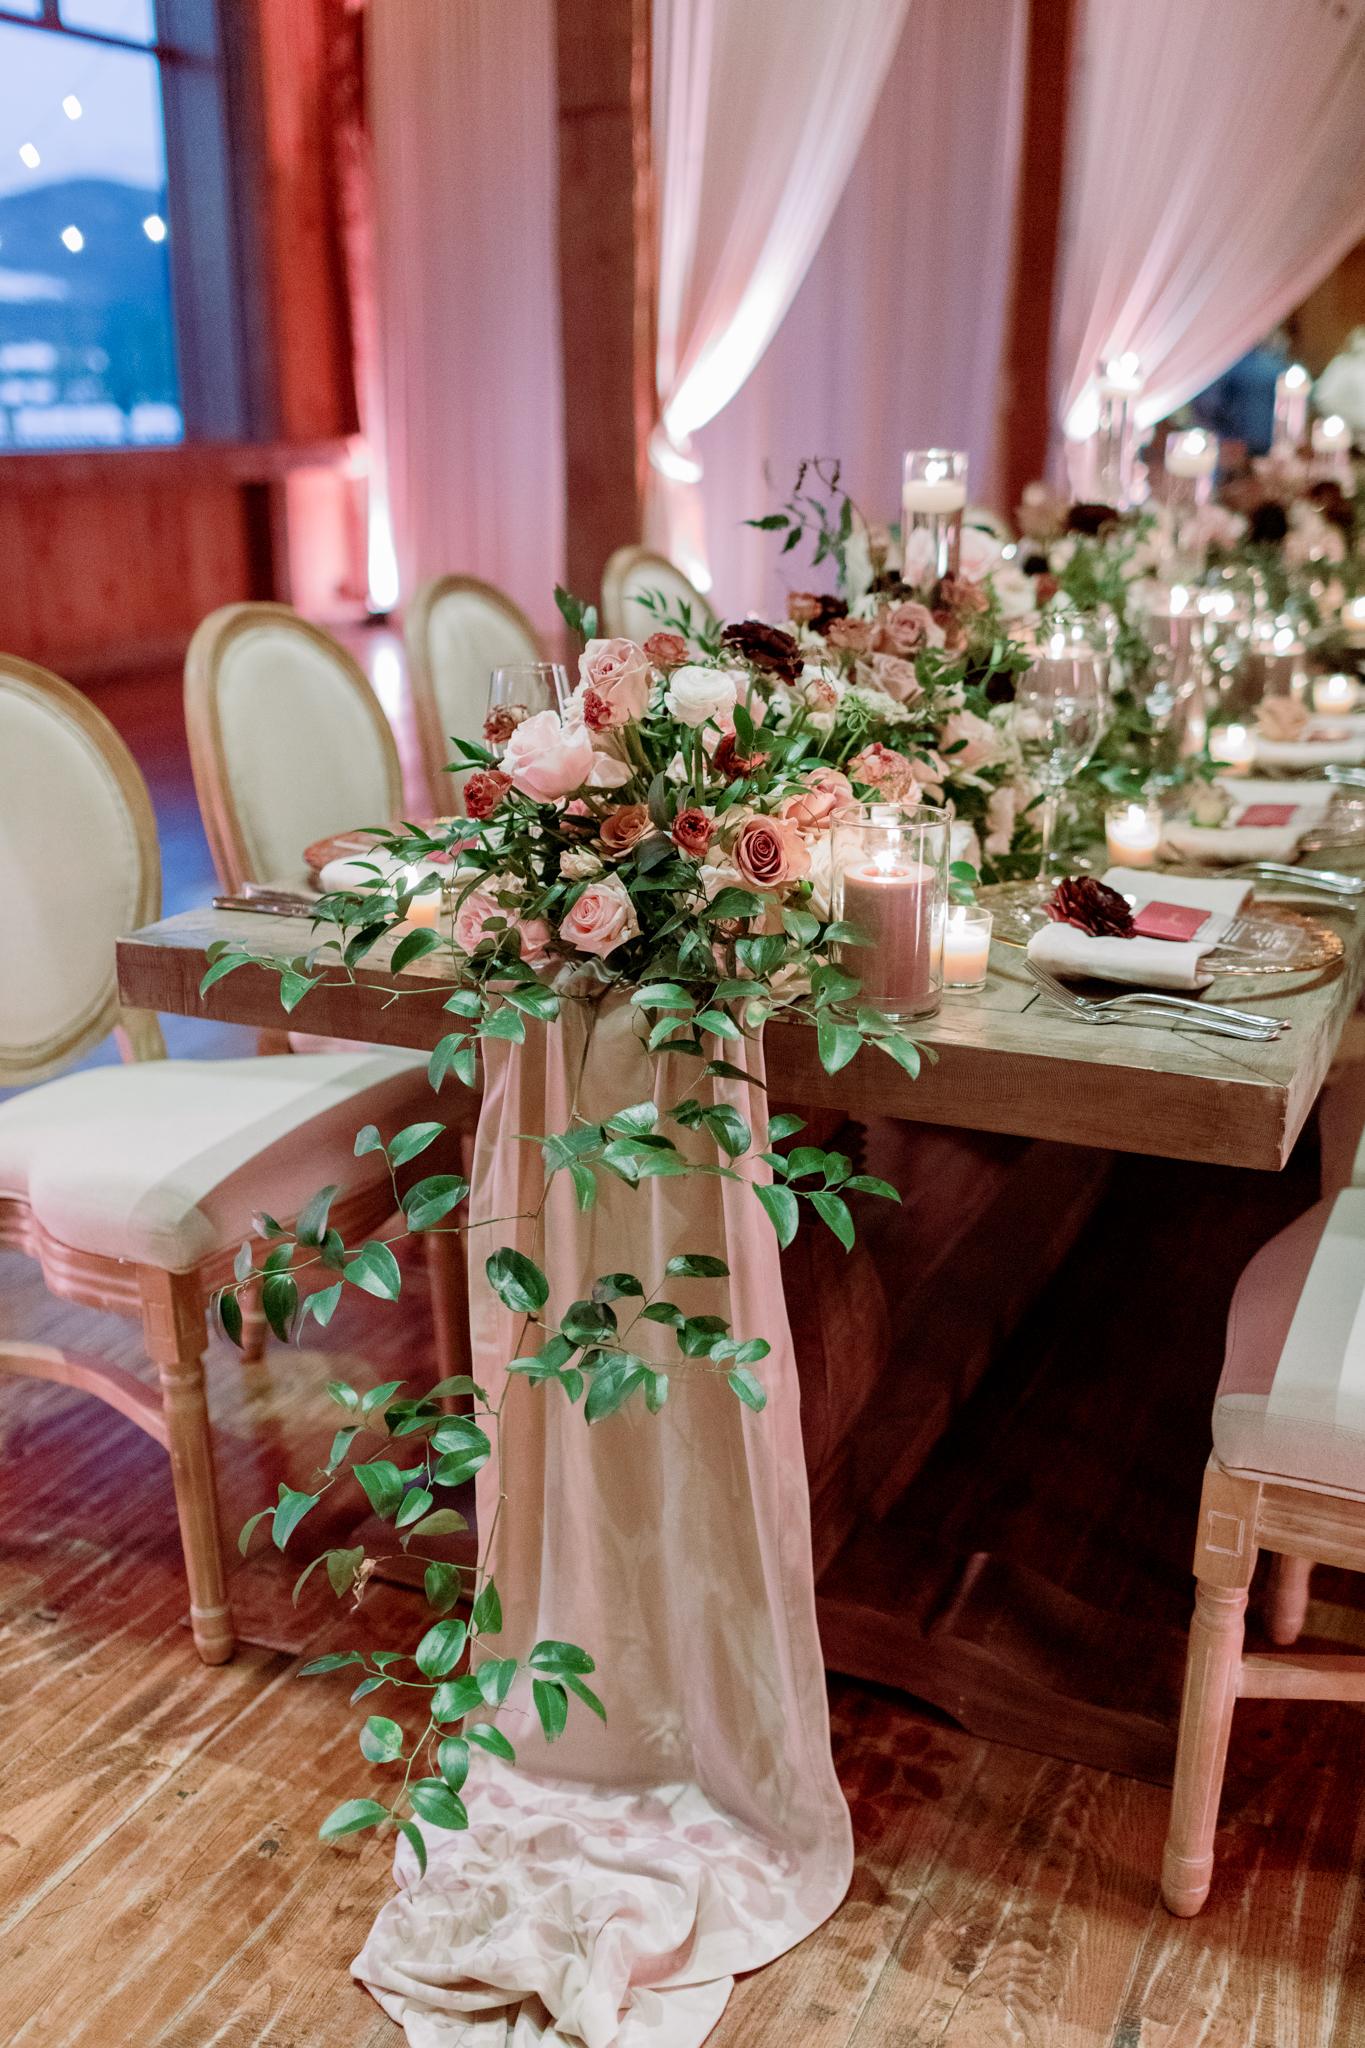 Devils-Thumb-Ranch-Tabernash-Colorado-Winter-Broad-Axe-Barn-Reception-LaRue-Florals-Table-Runner-Drapery